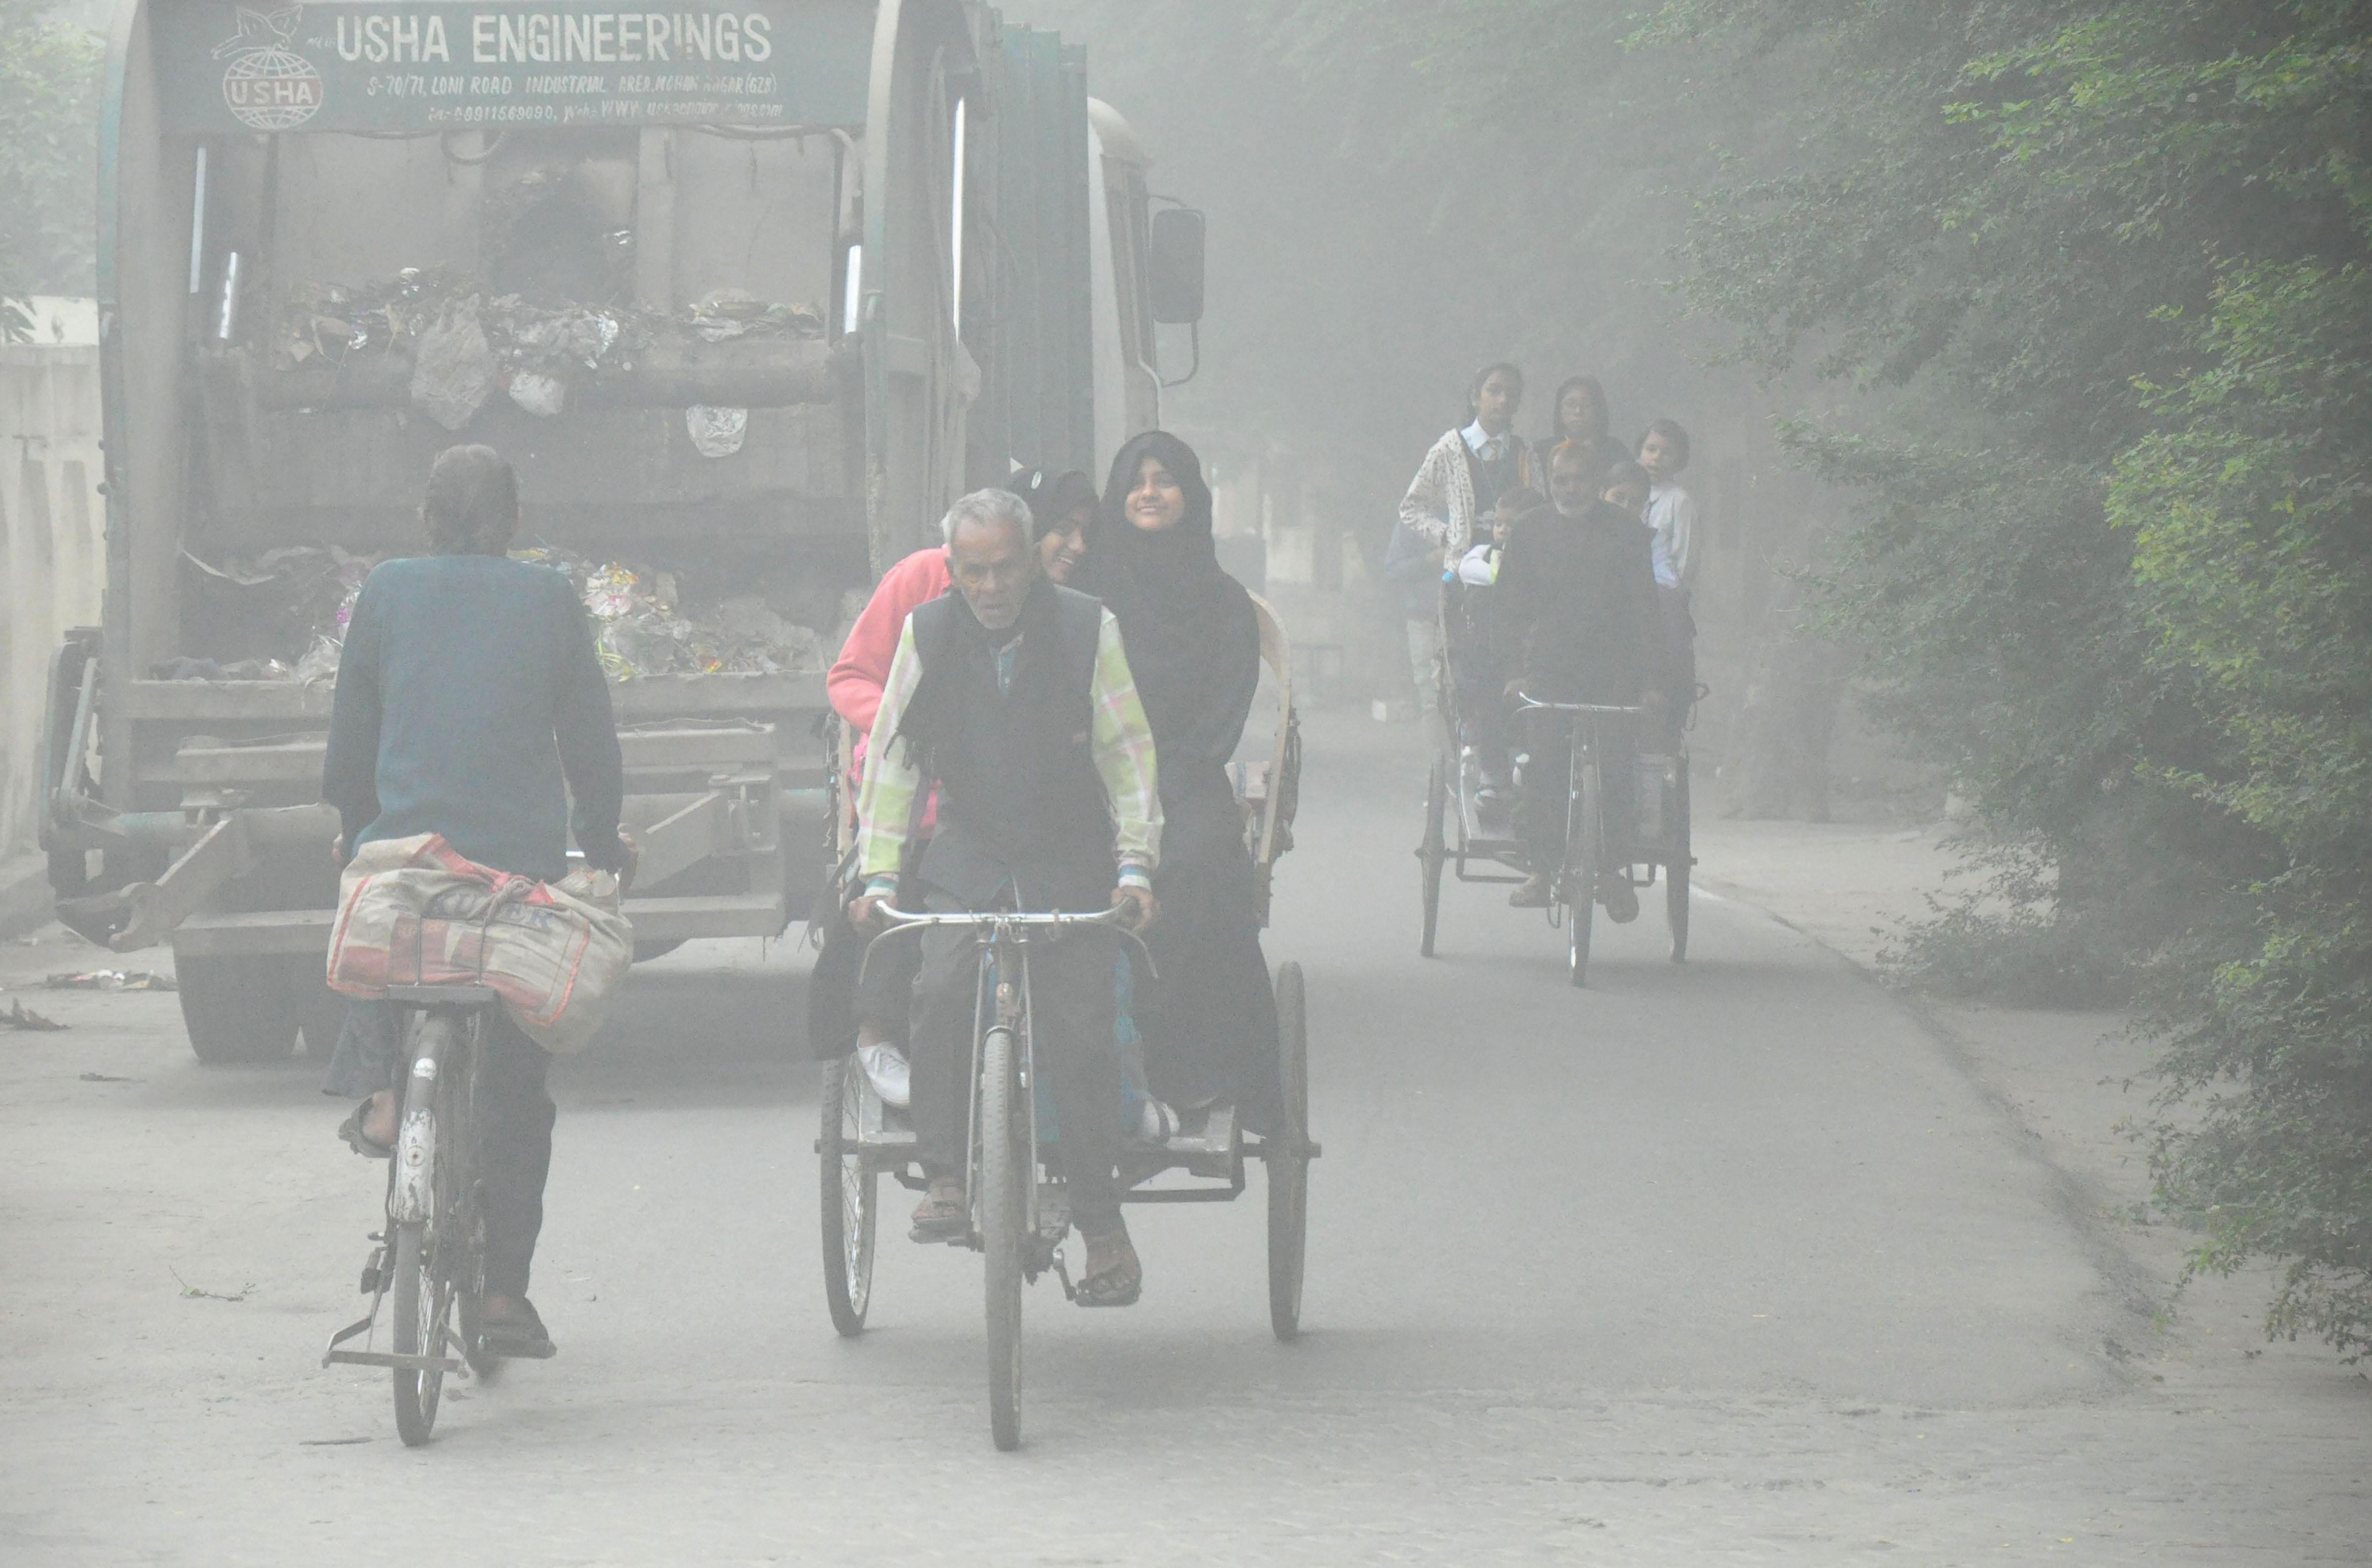 Rickshaw pullers ride through dense smog, in Moradabad, Monday, November 4, 2019.